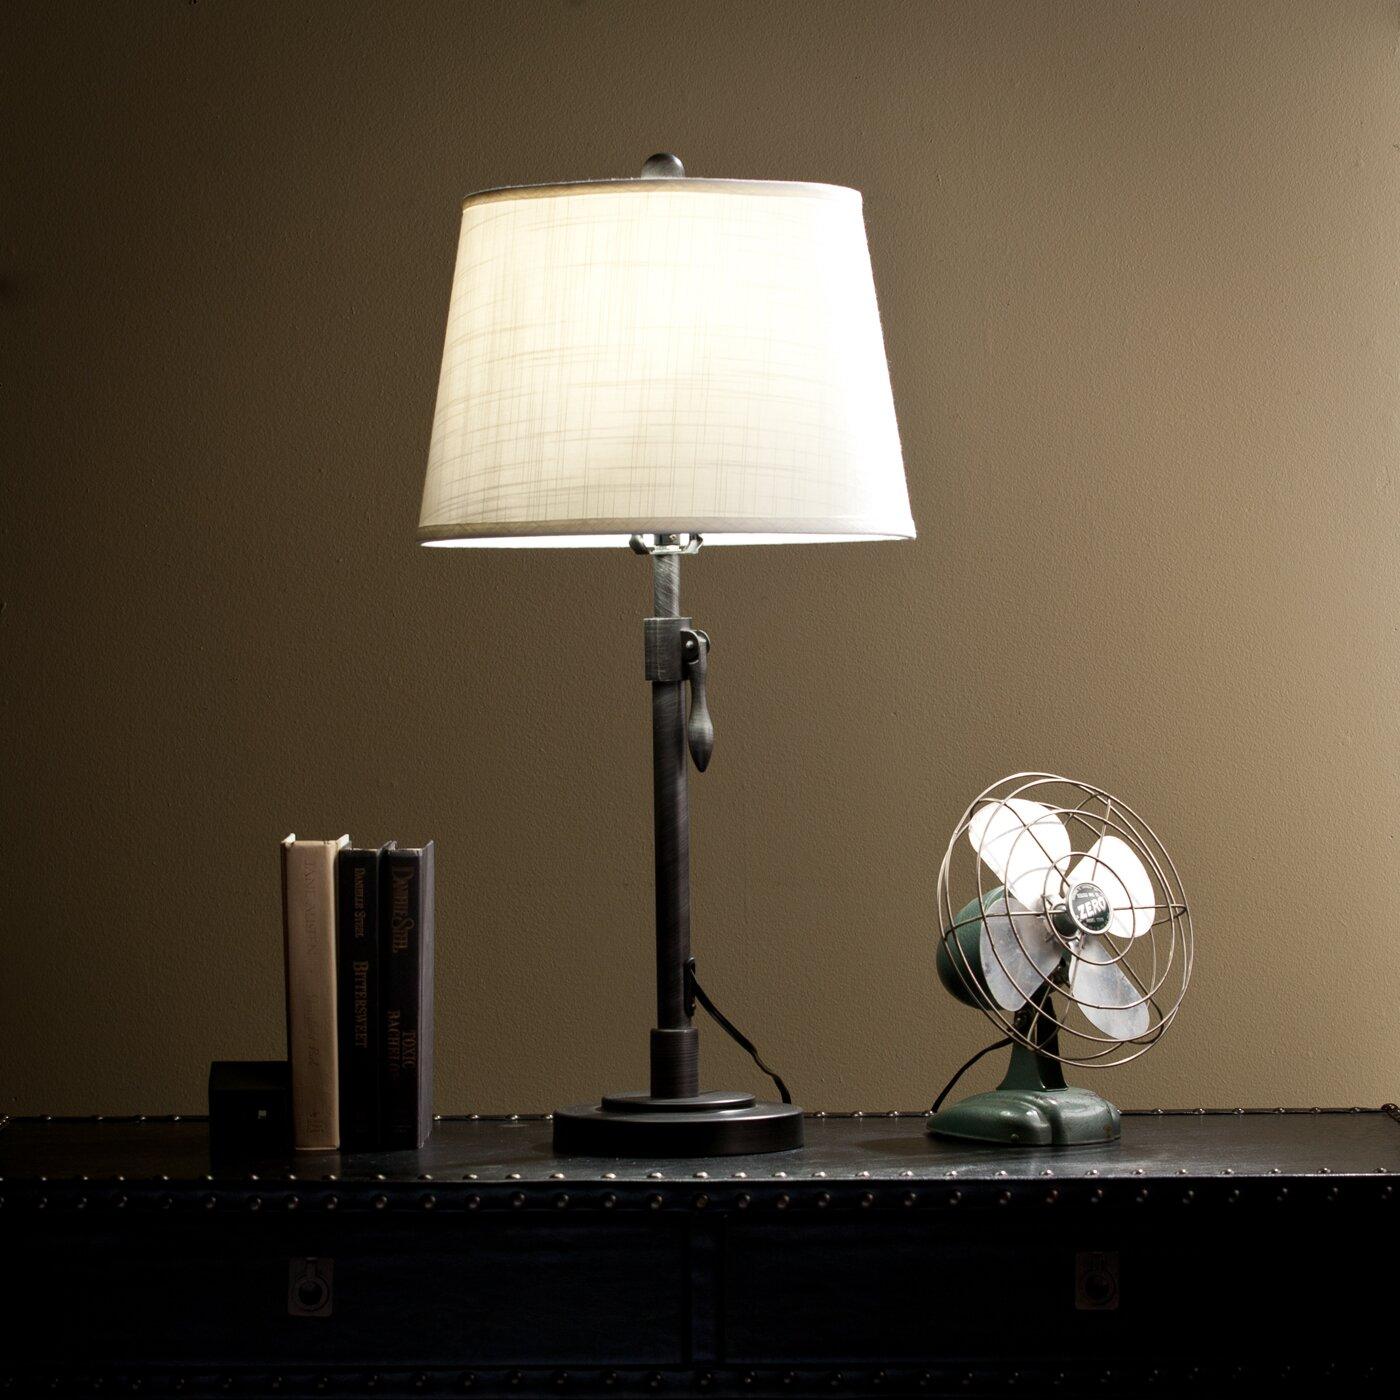 Trent austin design needles 31 table lamp reviews wayfair for Table lamps austin tx